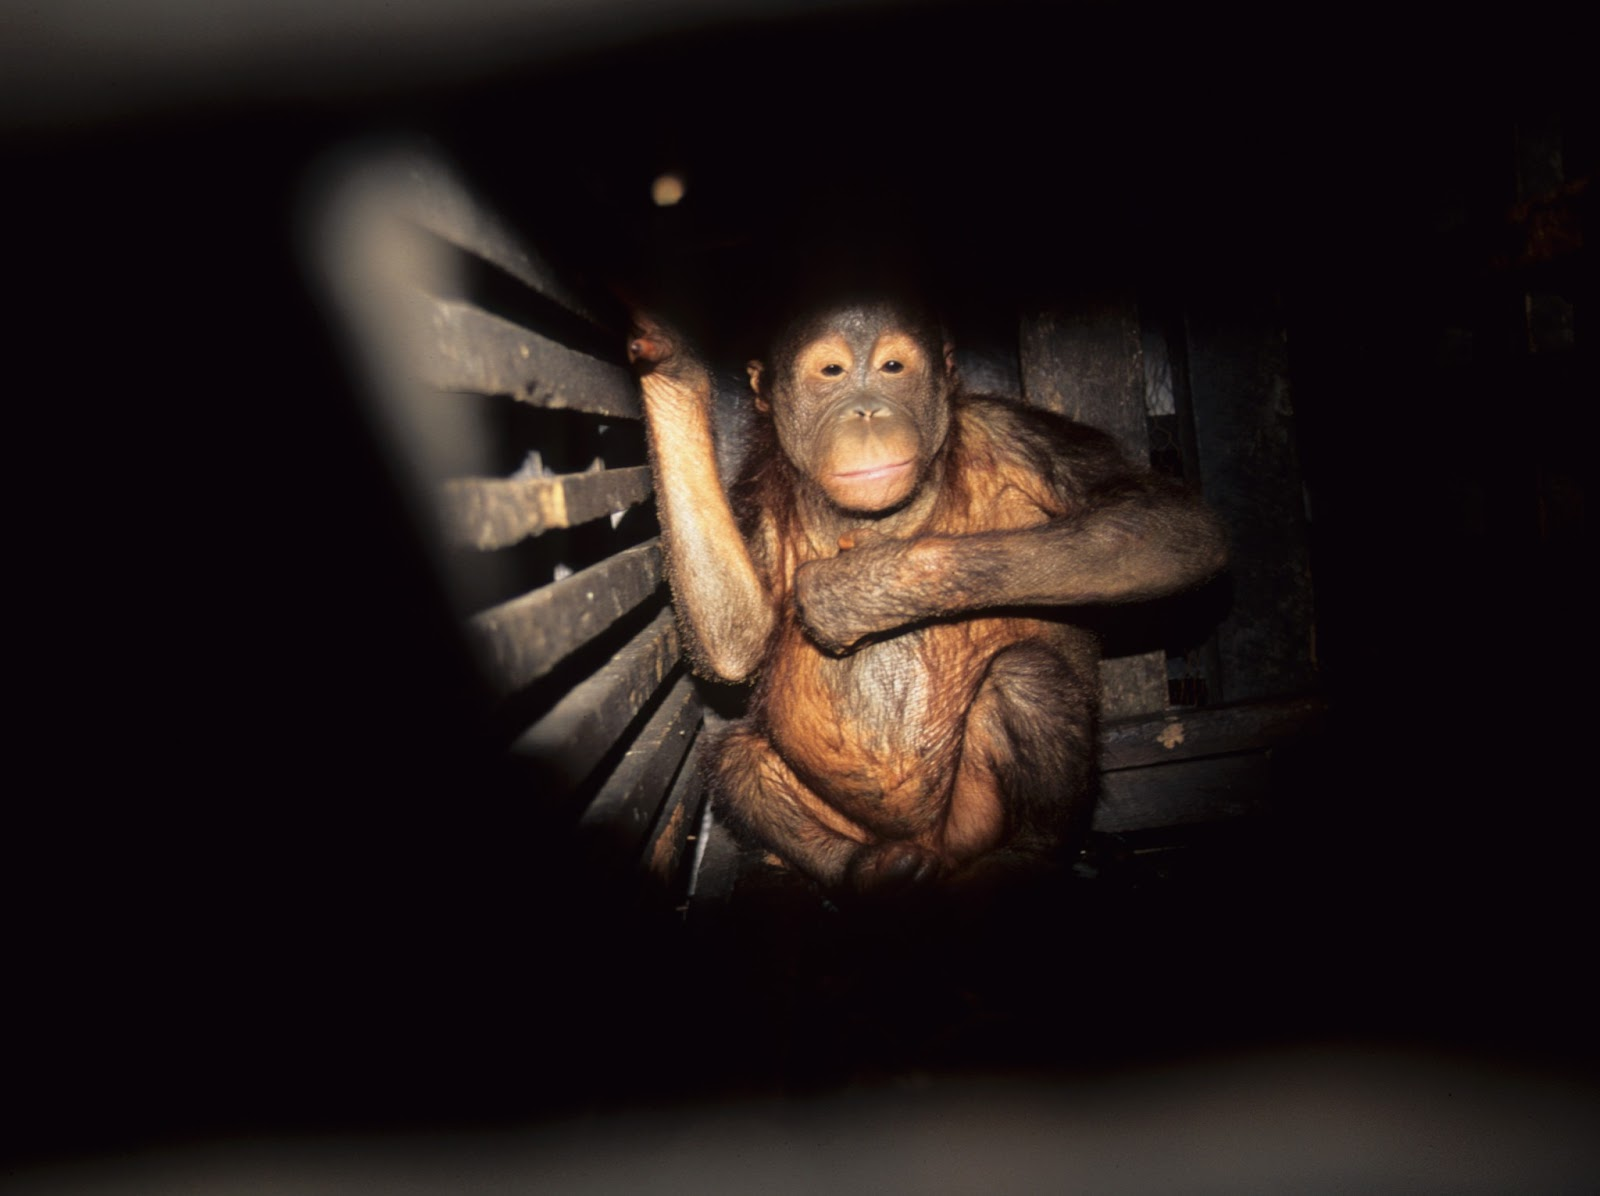 Orangutan-human hentai hardcore pics